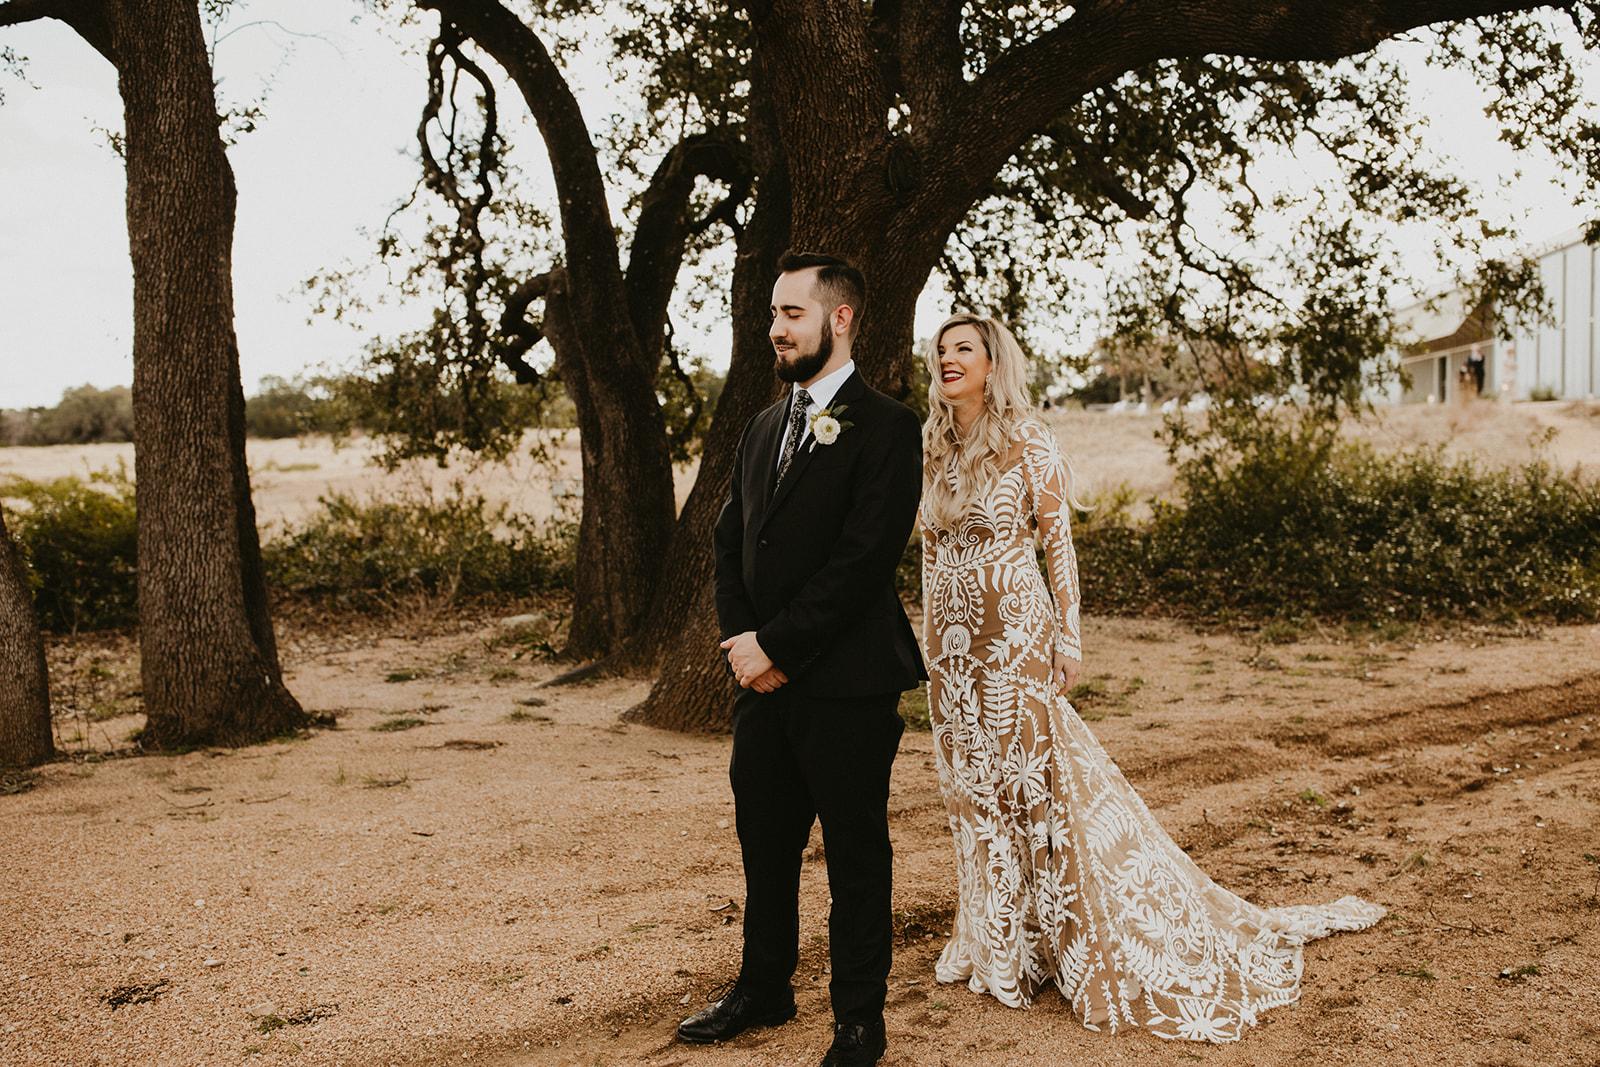 Epoch Co+ | Bride + Groom First Look | Austin Wedding Venue Prospect House | Groom Attire + Floral Tie + Hops Boutonnière + Bridal Dress Rue De Seine Nude Underskirt  | Austin Wedding Planner